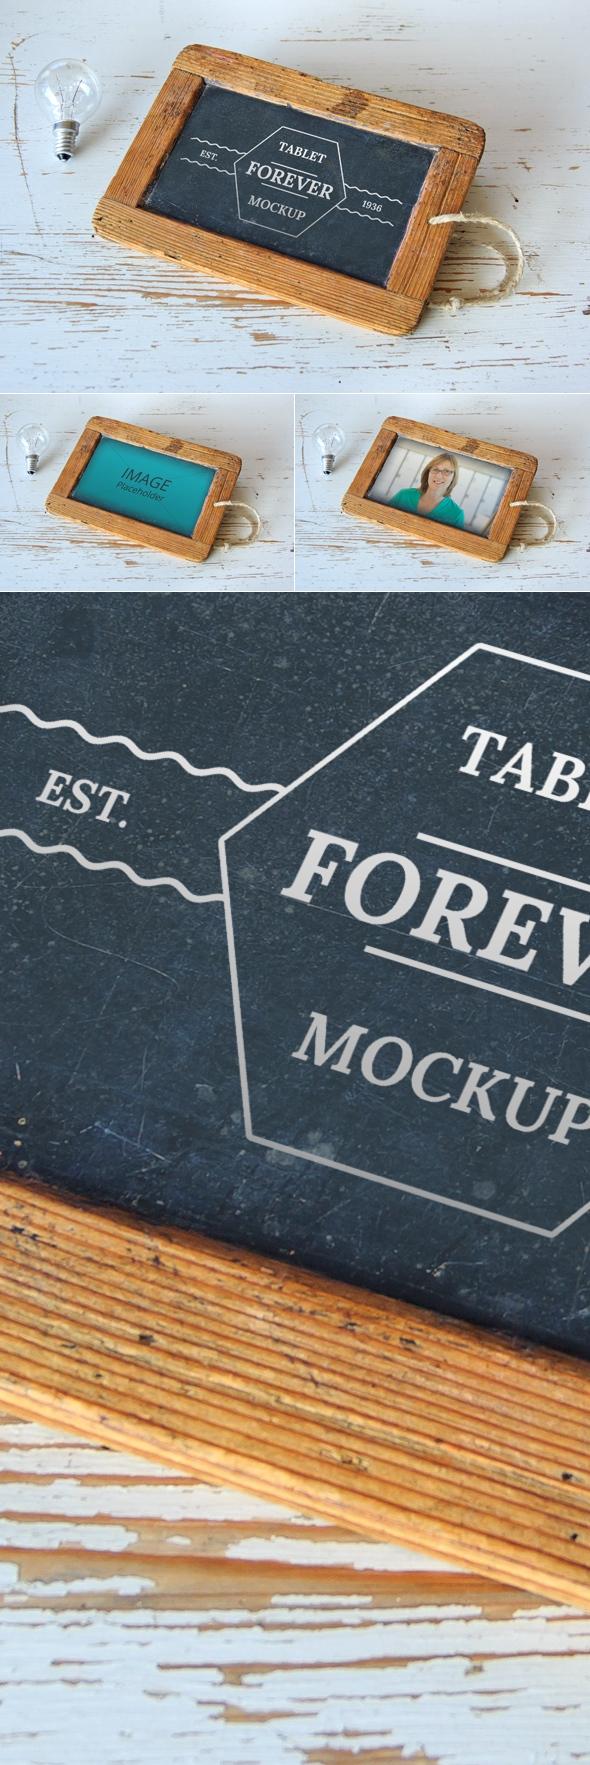 Free Tablet Forever Mockup PSD